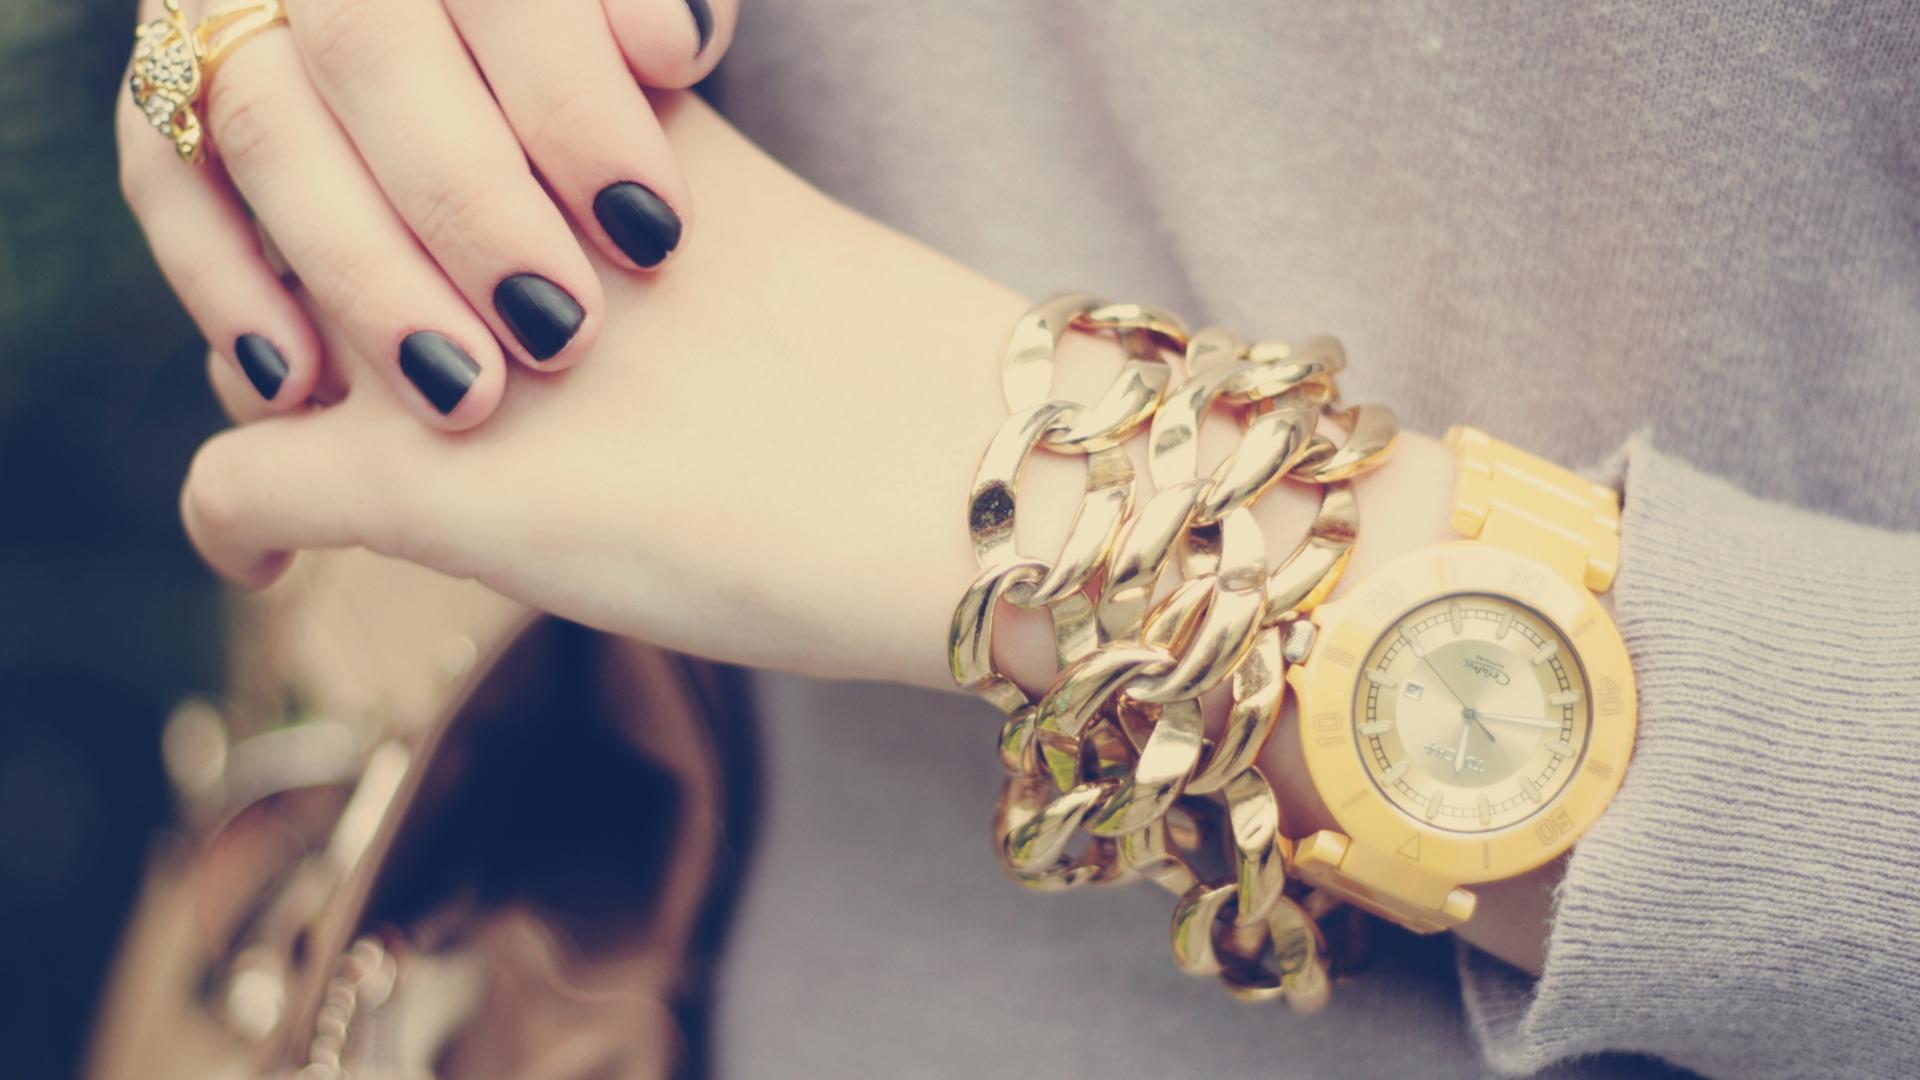 Wallpaper : hands, yellow, blue, jewelry, watches, girl, hand ...